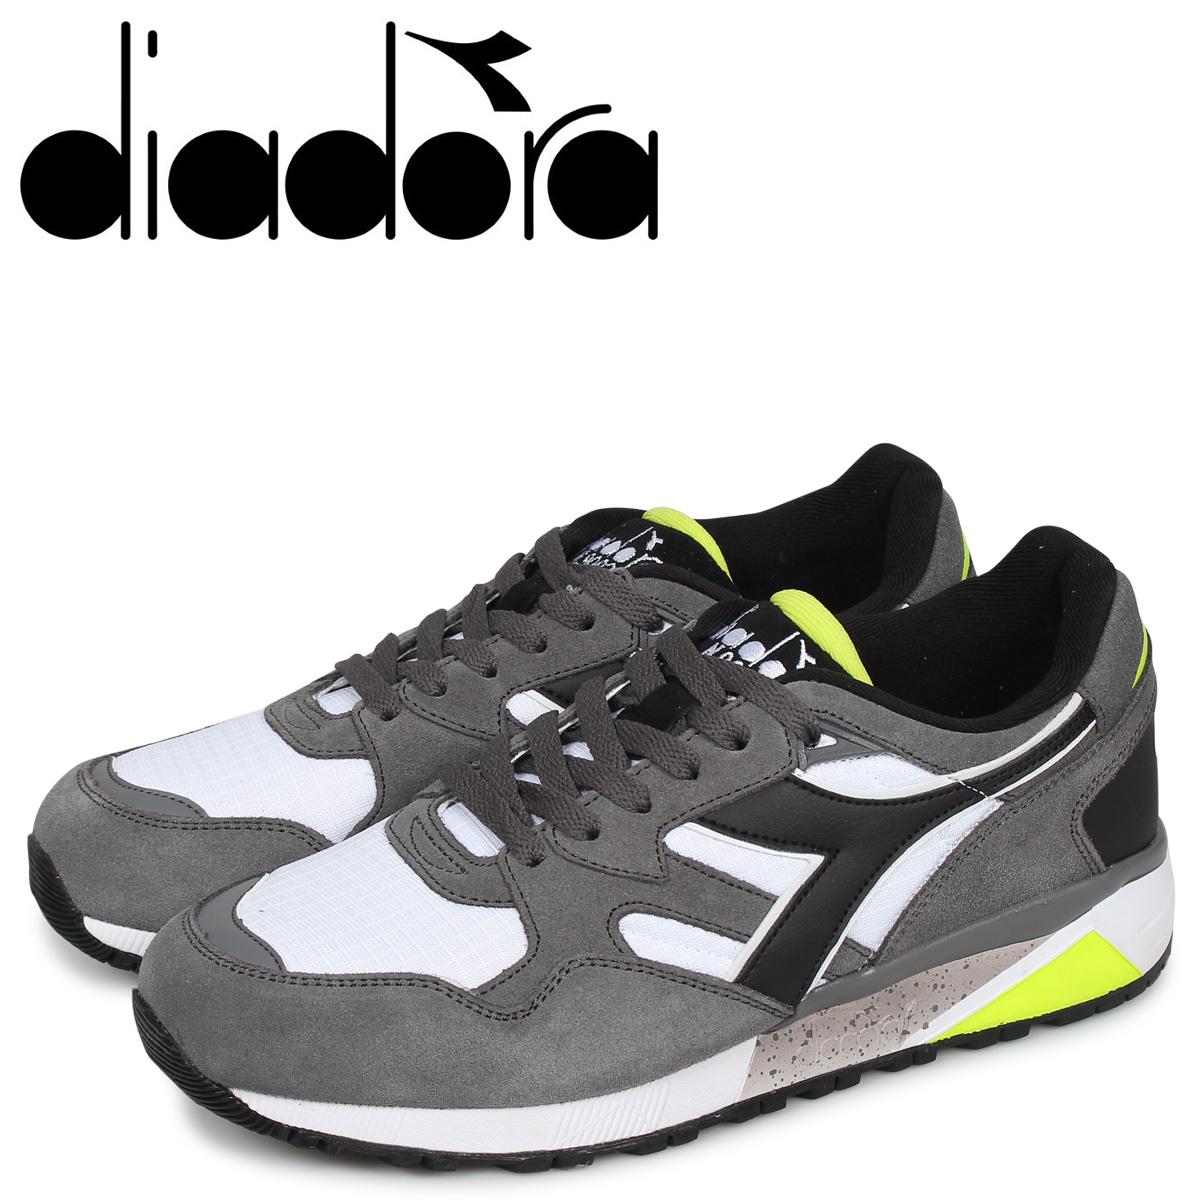 Diadora ディアドラ ニュートラ 9002 スニーカー メンズ N9002 グレー 173073-4400